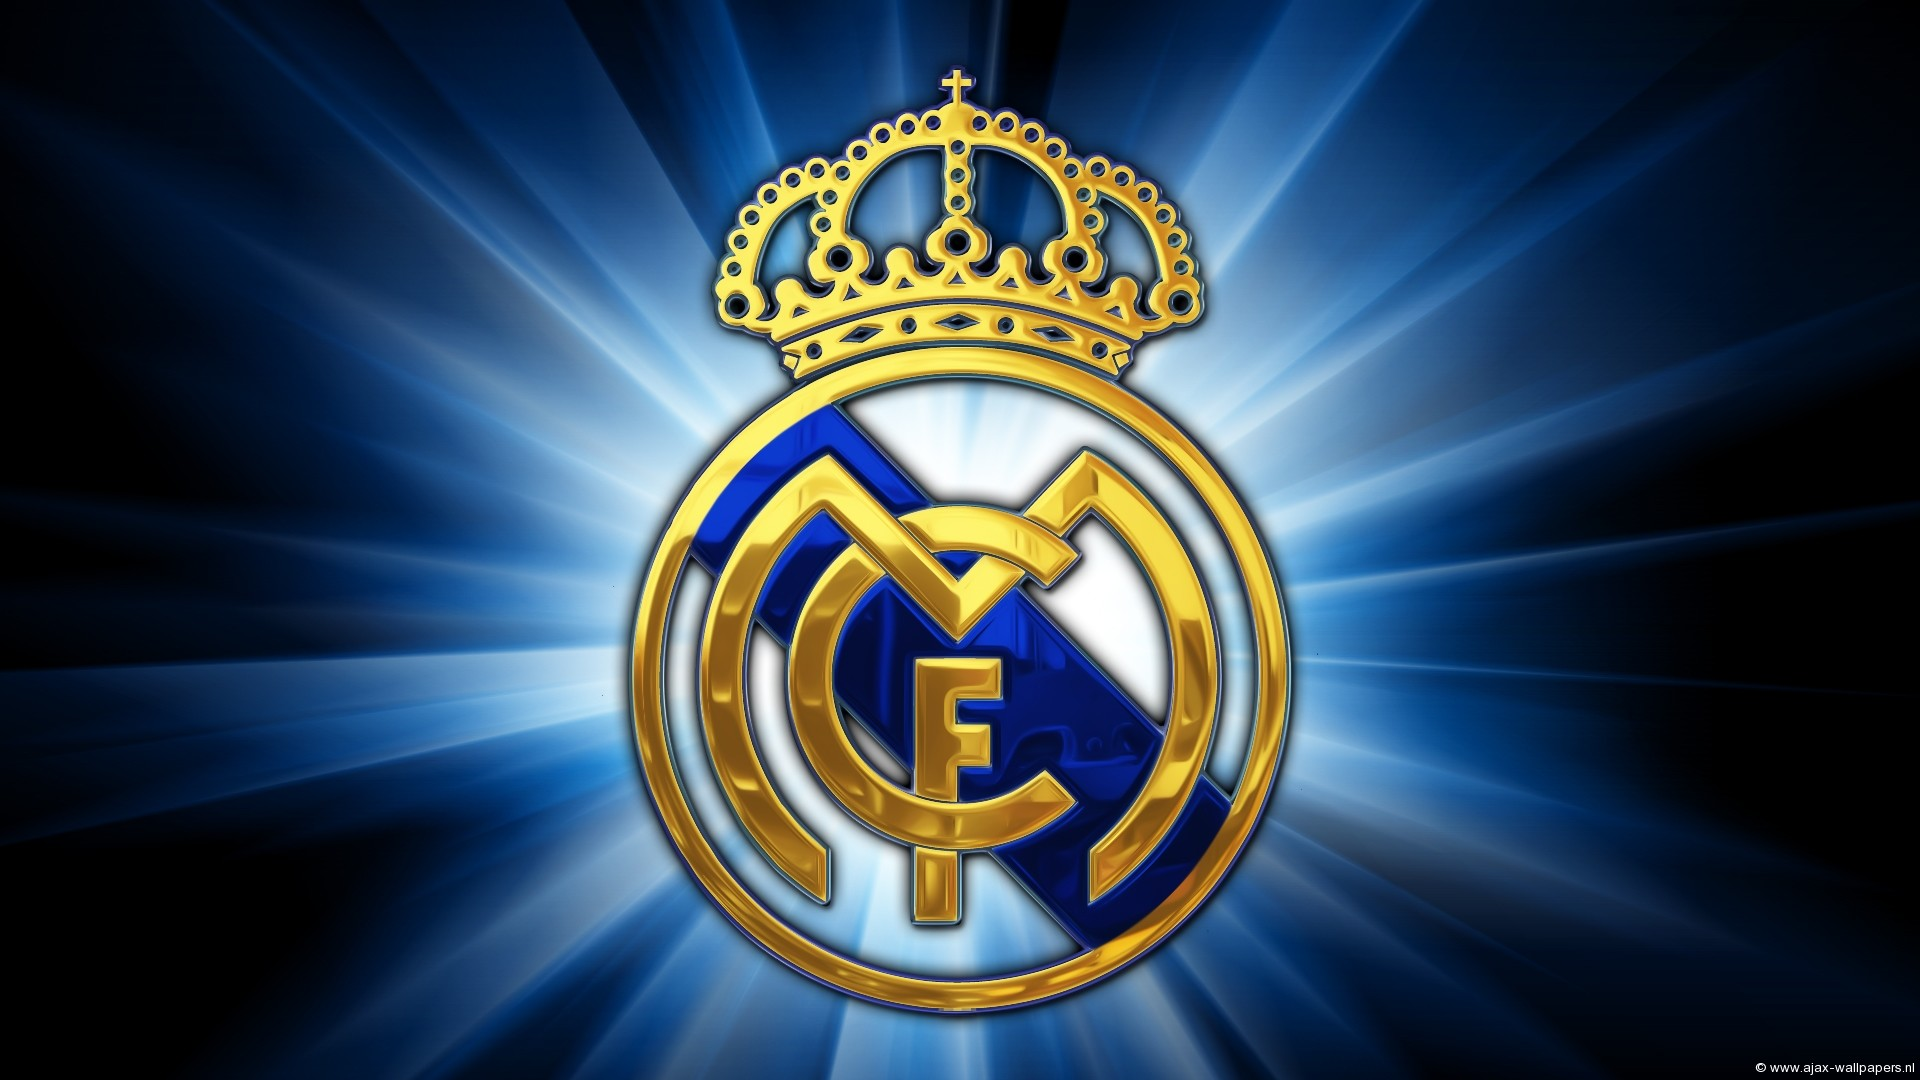 Cristiano Ronaldo Real Madrid HD desktop wallpaper